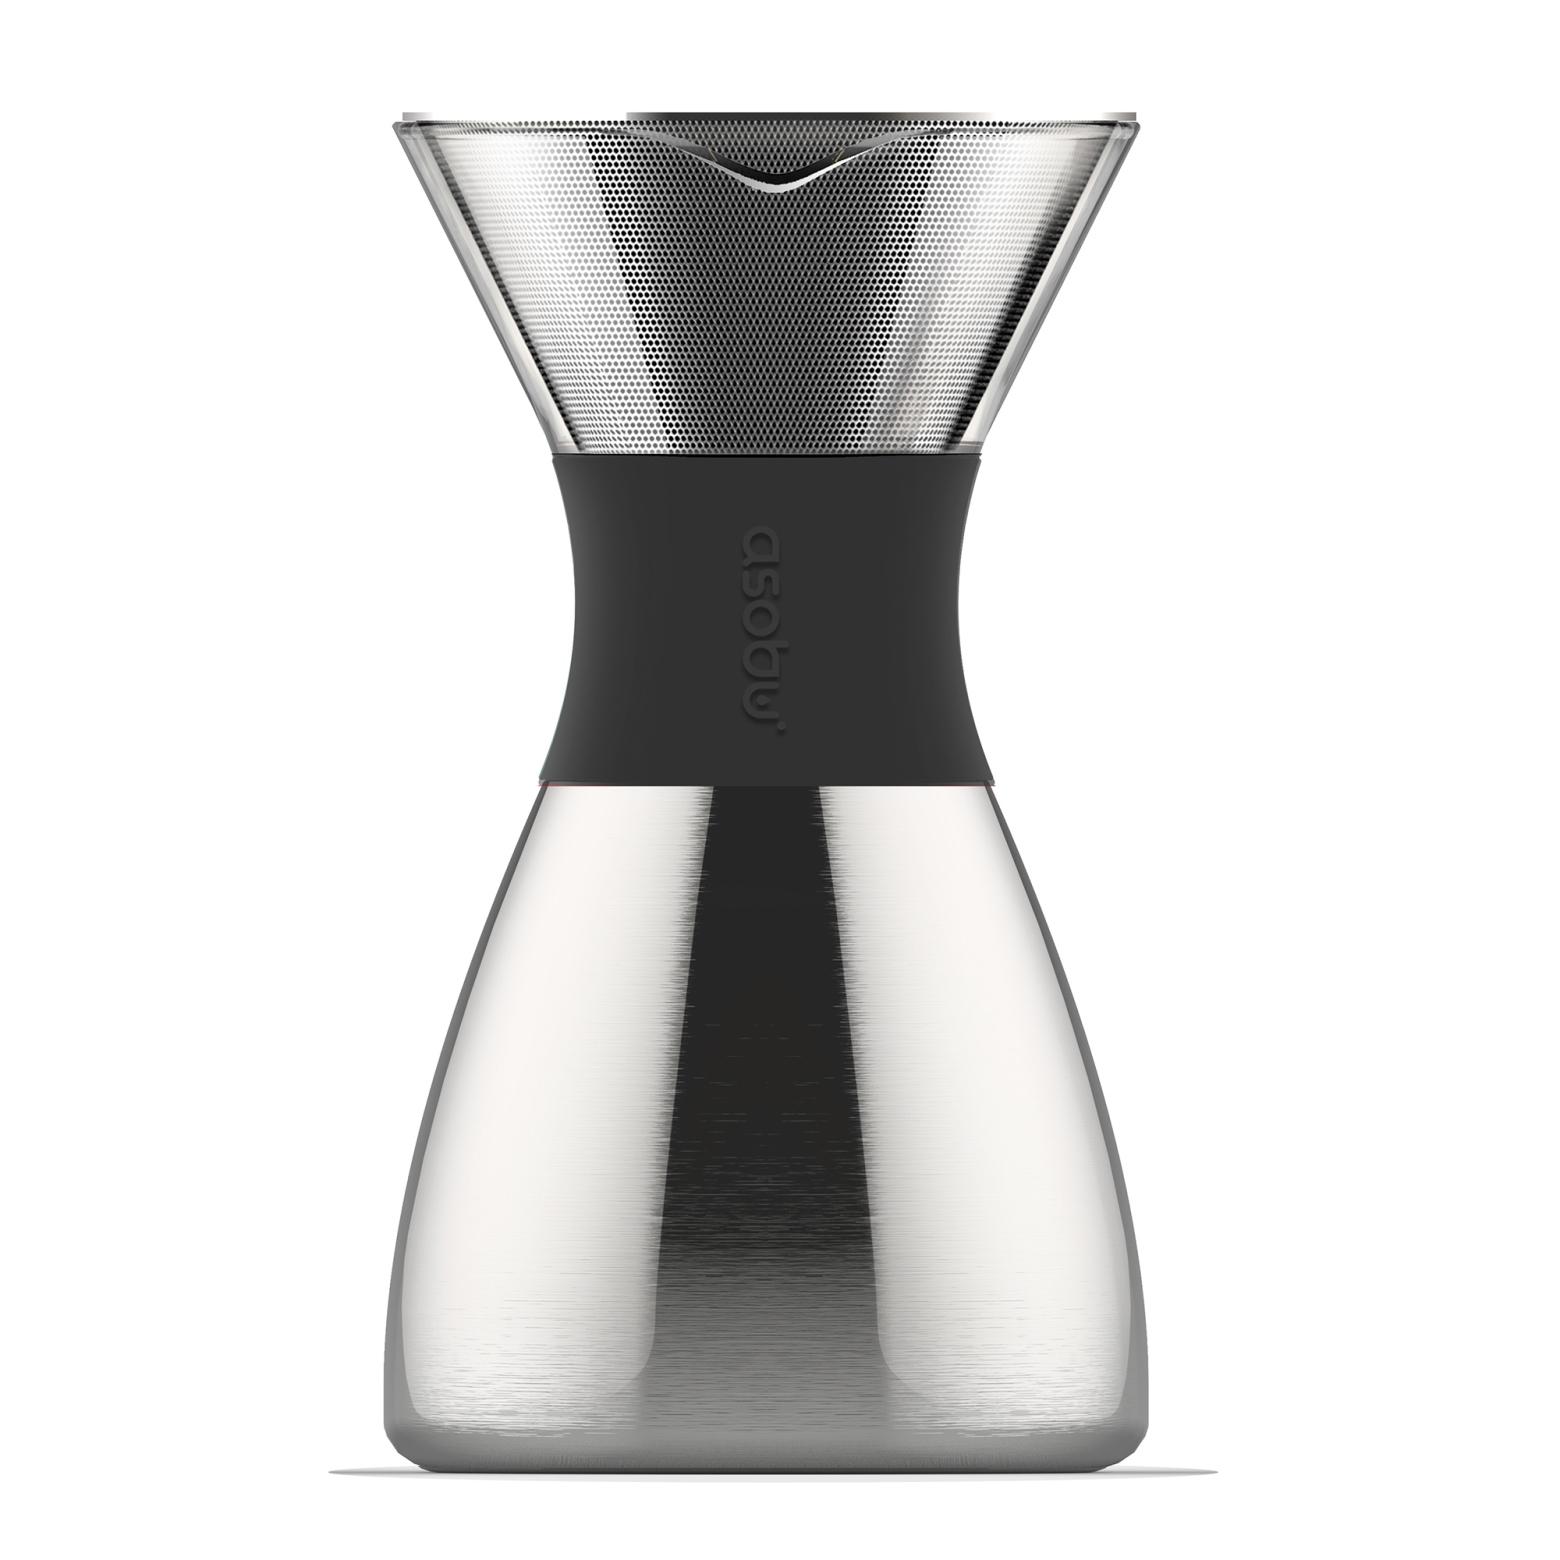 Онлайн каталог PROMENU: Кофеварка Asobu POUR OVER, объем 1,18 л, серебристый                               PO300 SILVER/BLACK